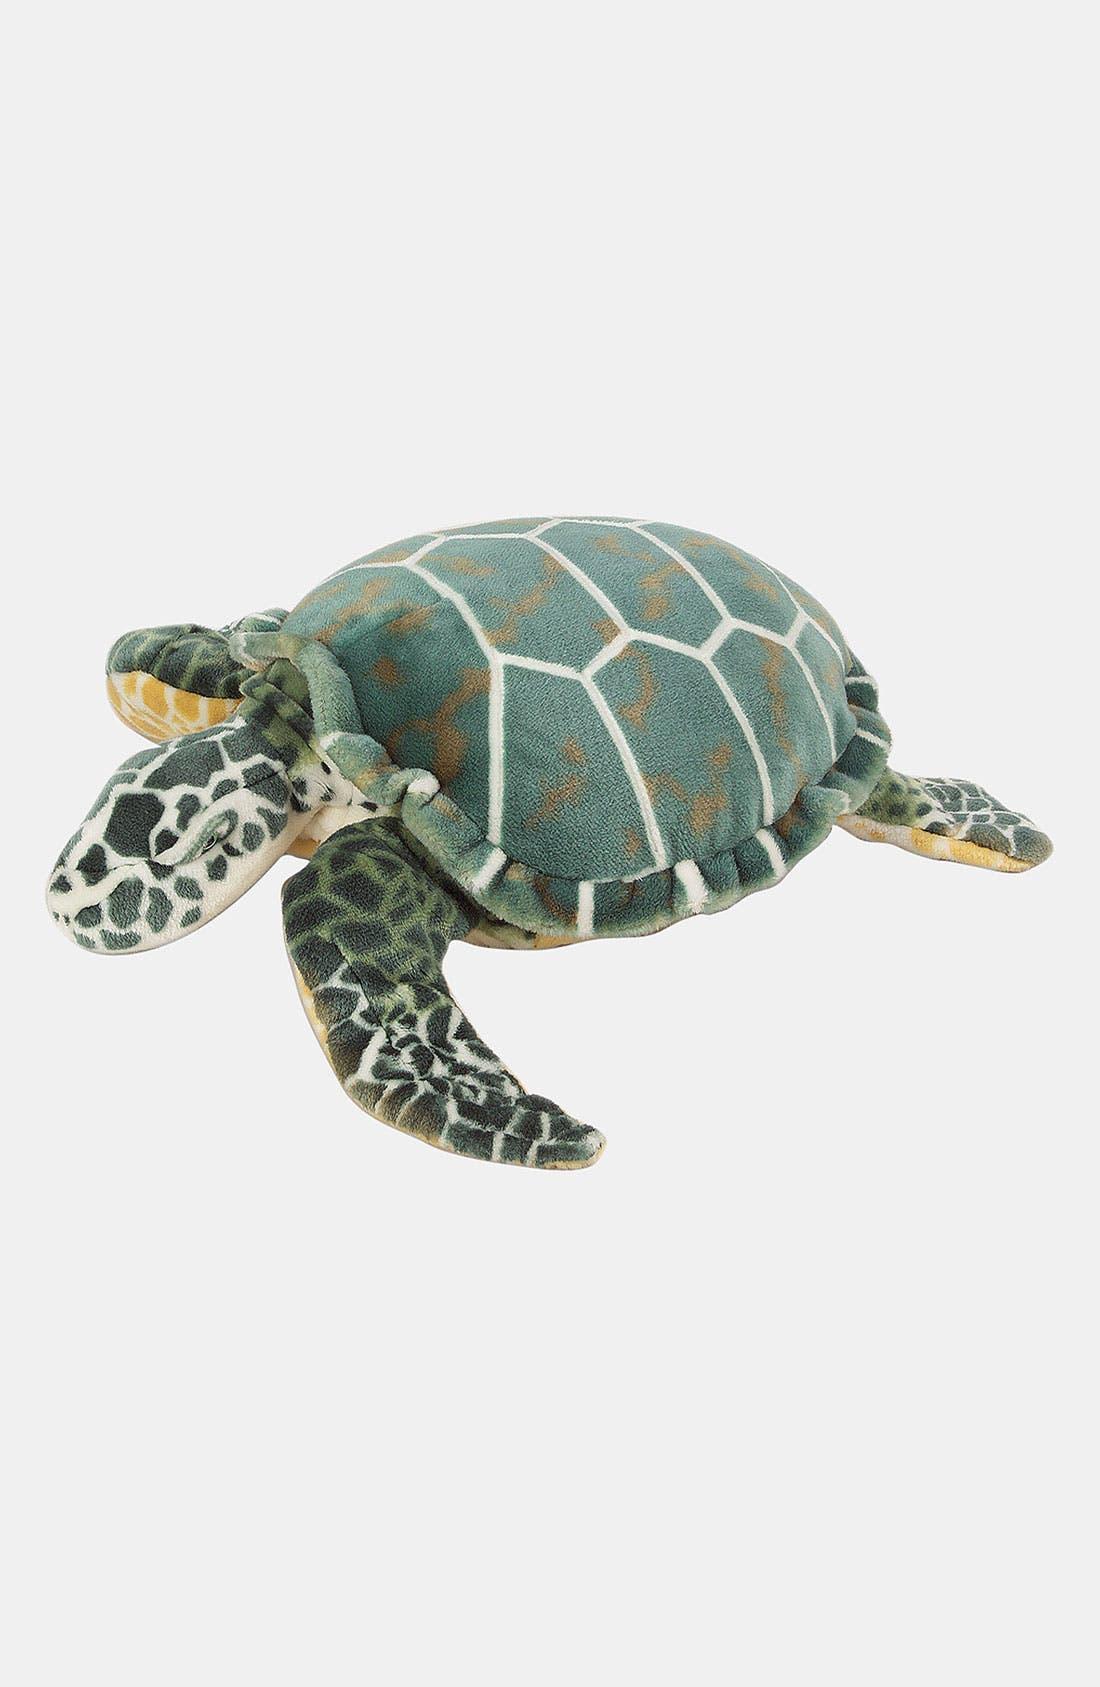 Oversized Plush Stuffed Sea Turtle,                         Main,                         color, Various